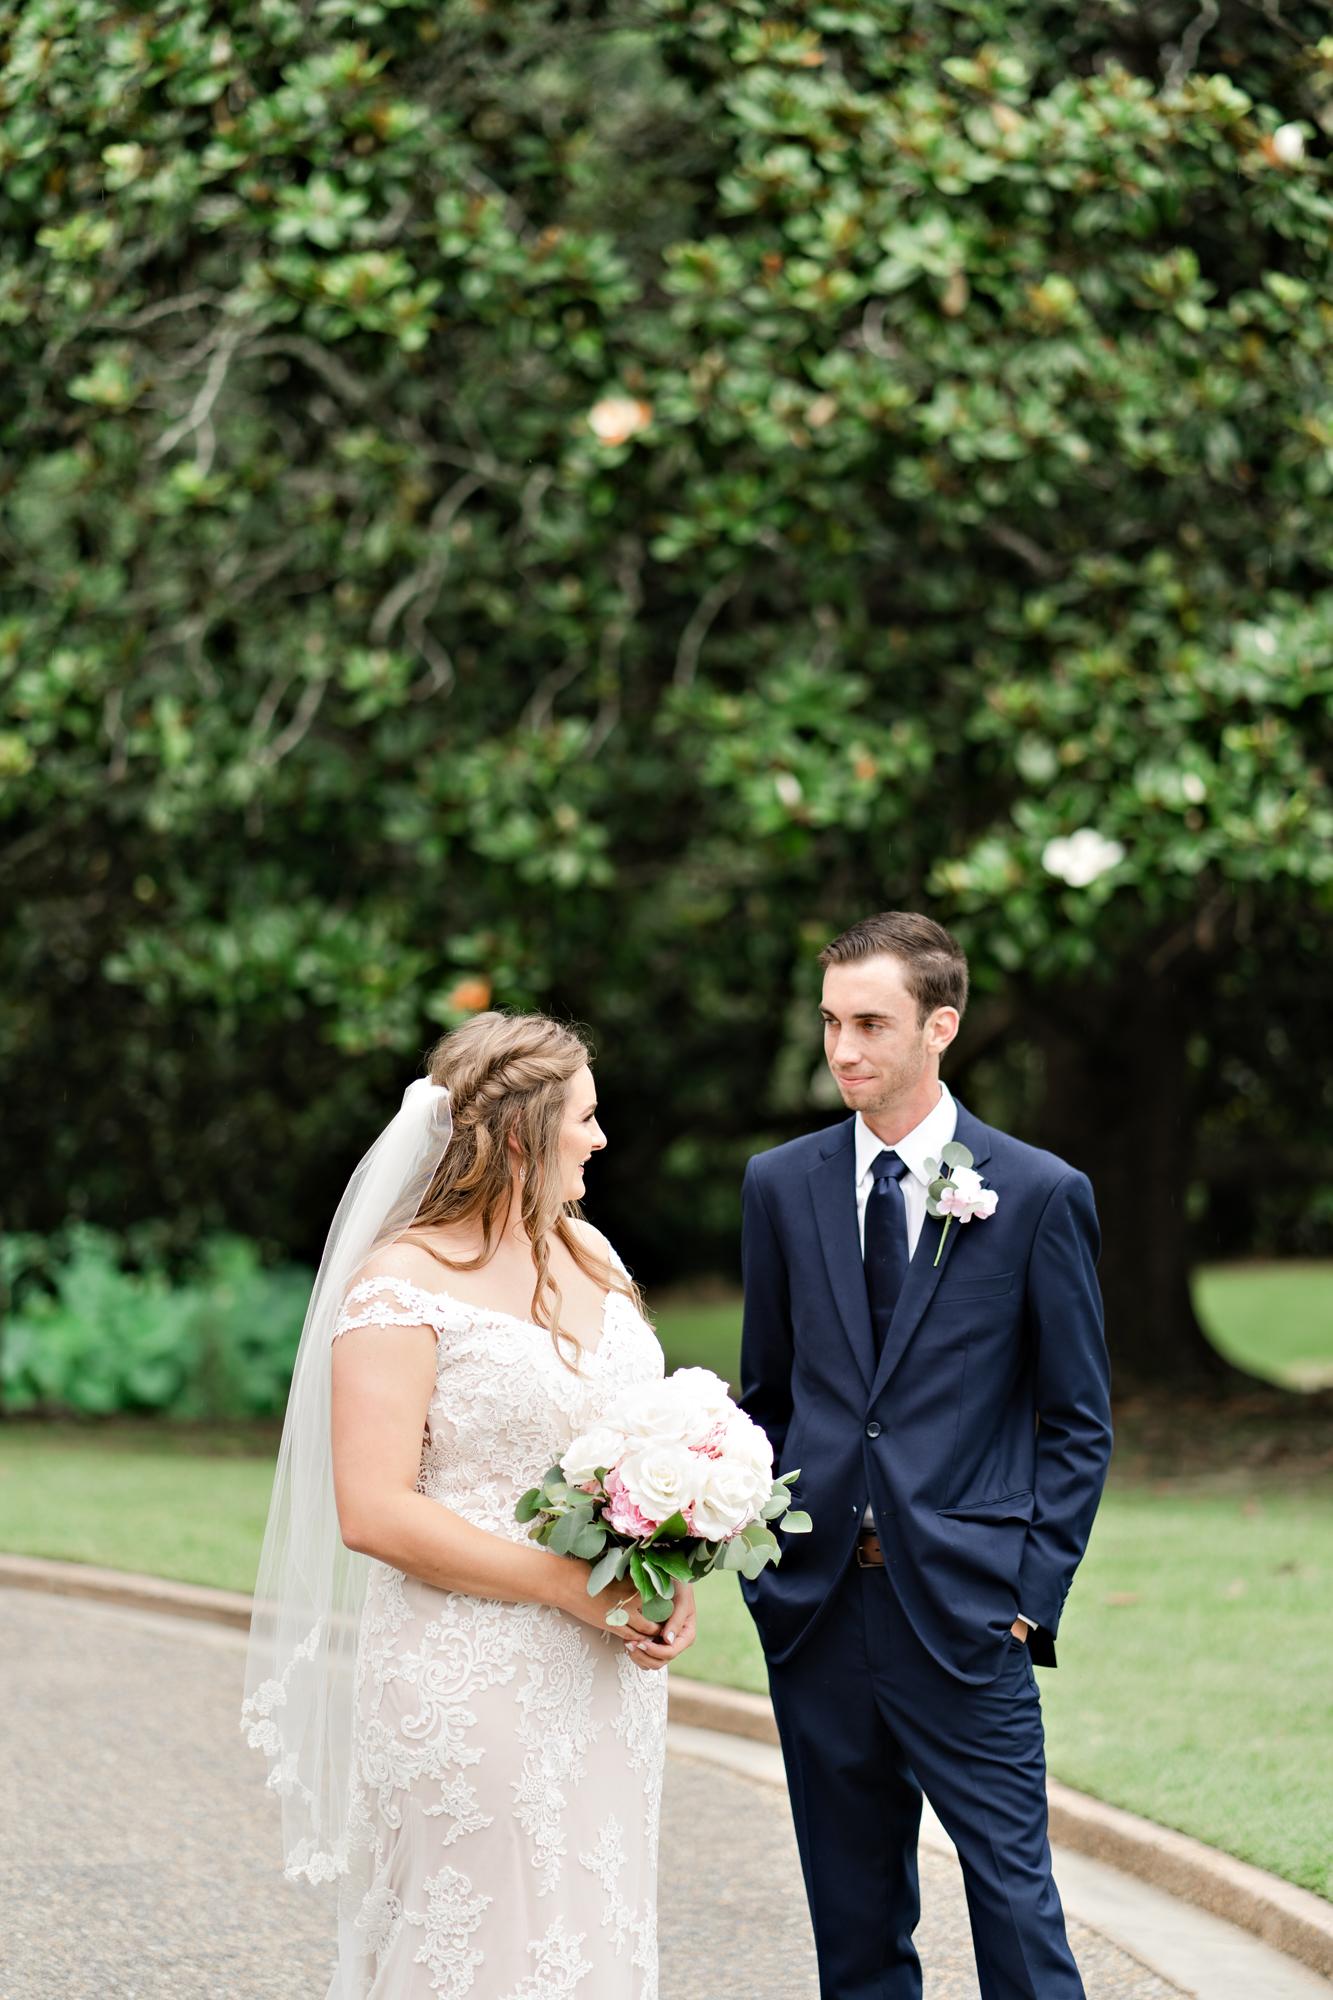 Alabama-Wedding-Photographer-Nick-Drollette-114.jpg